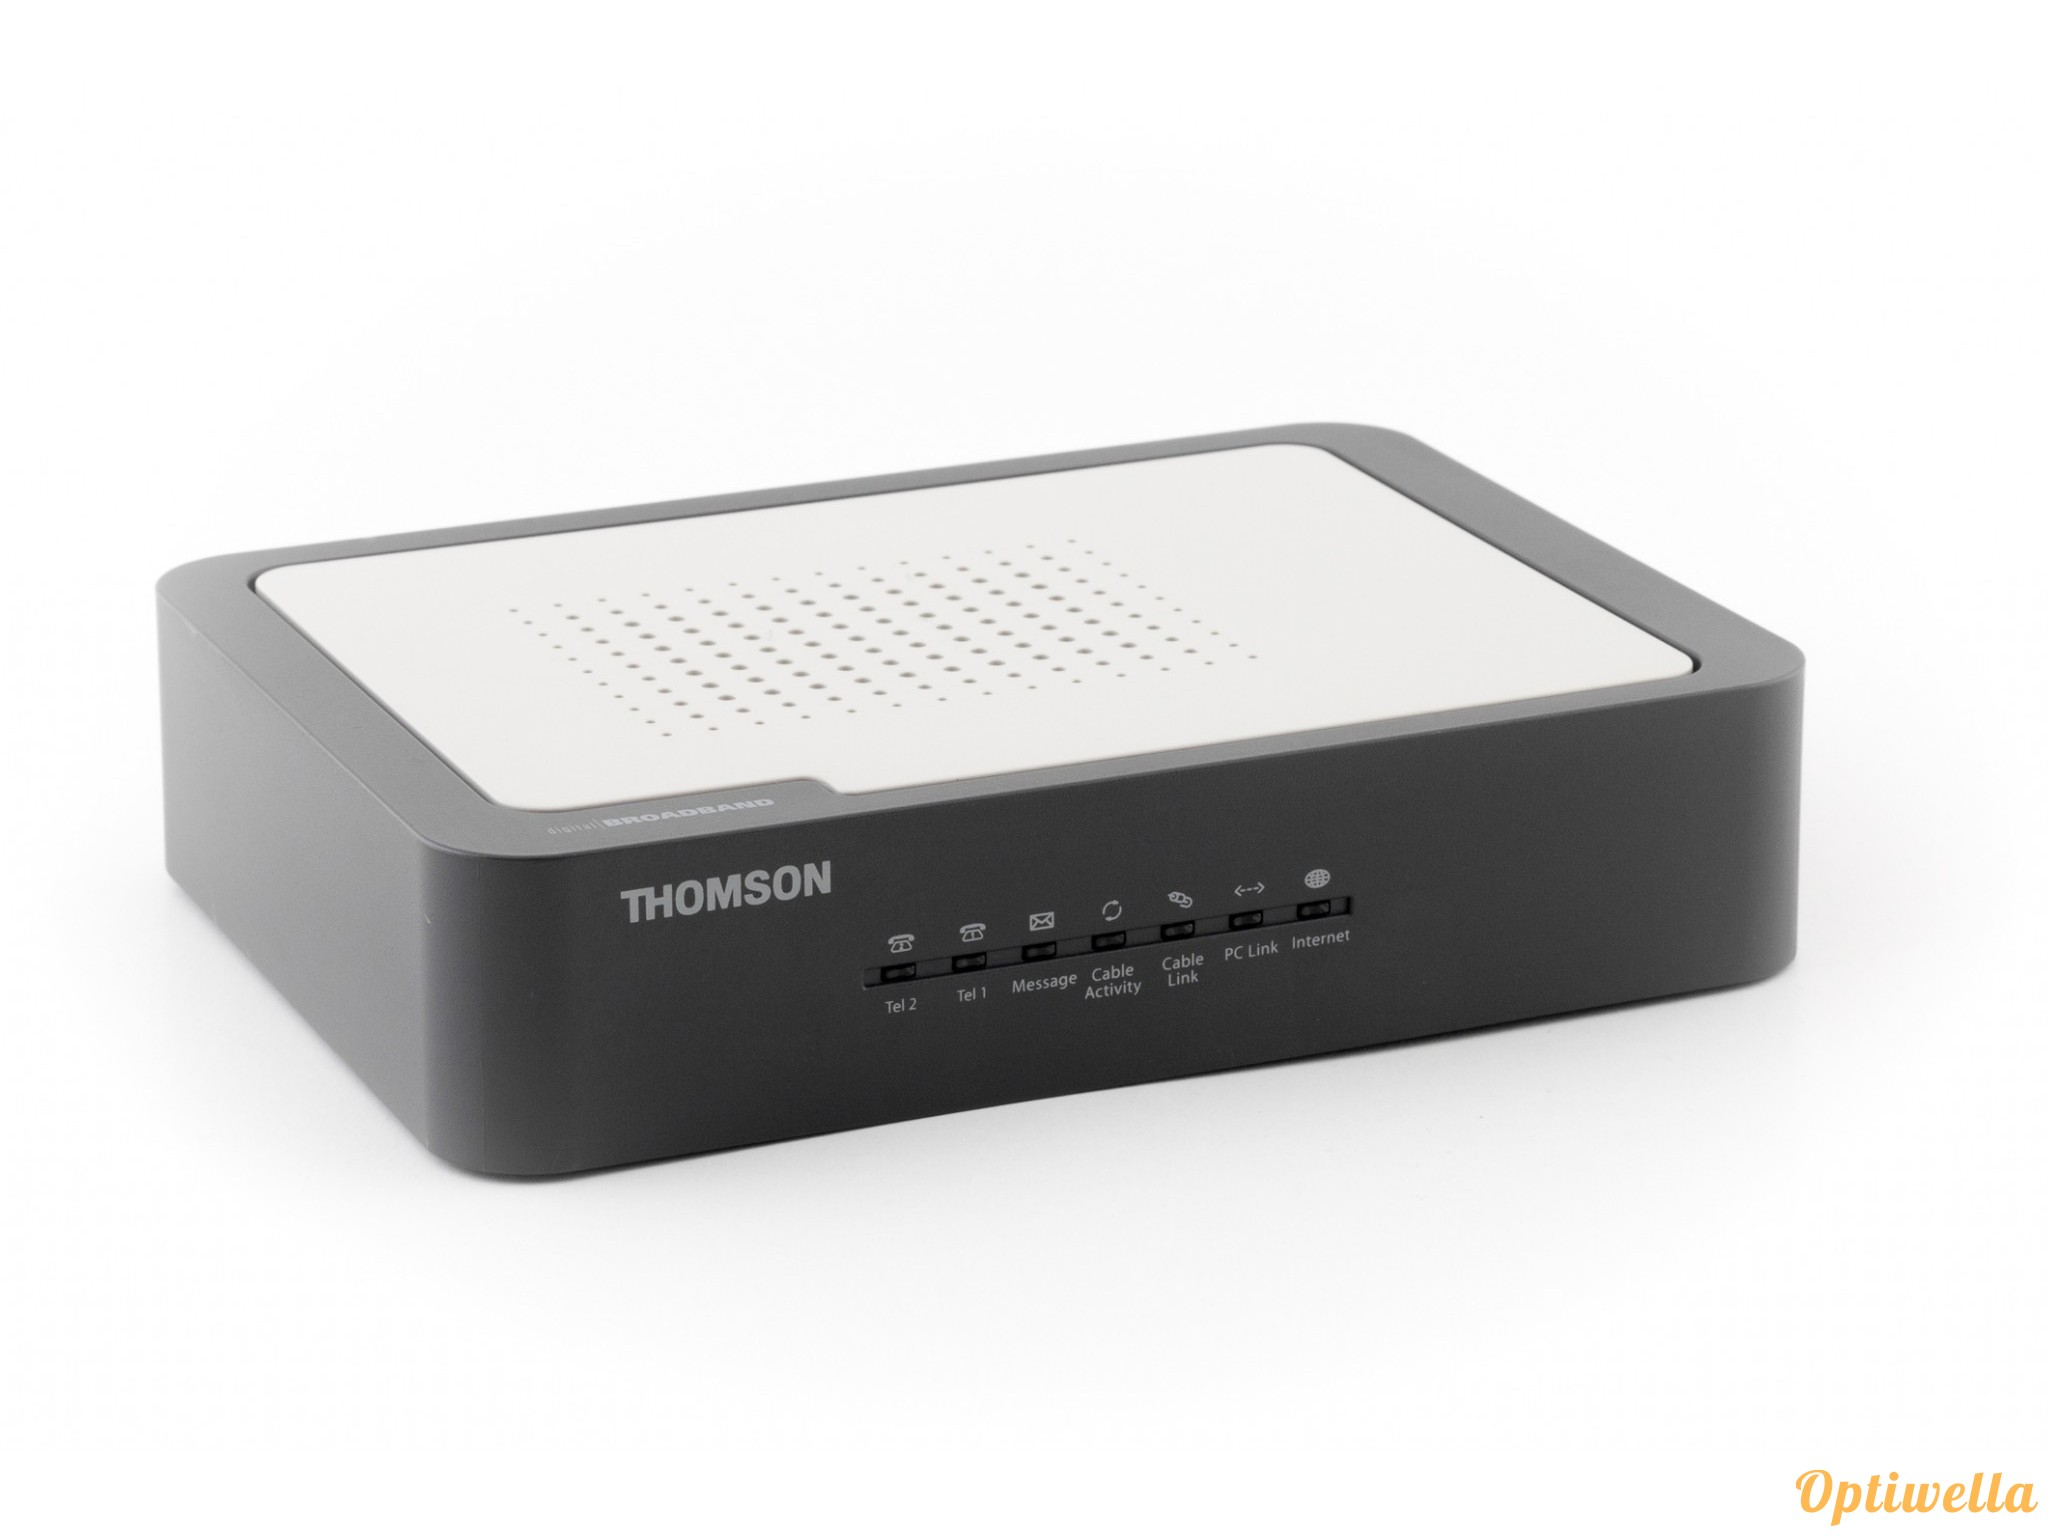 Thomson THG541 Voice Over IP Cable Modem | Modem